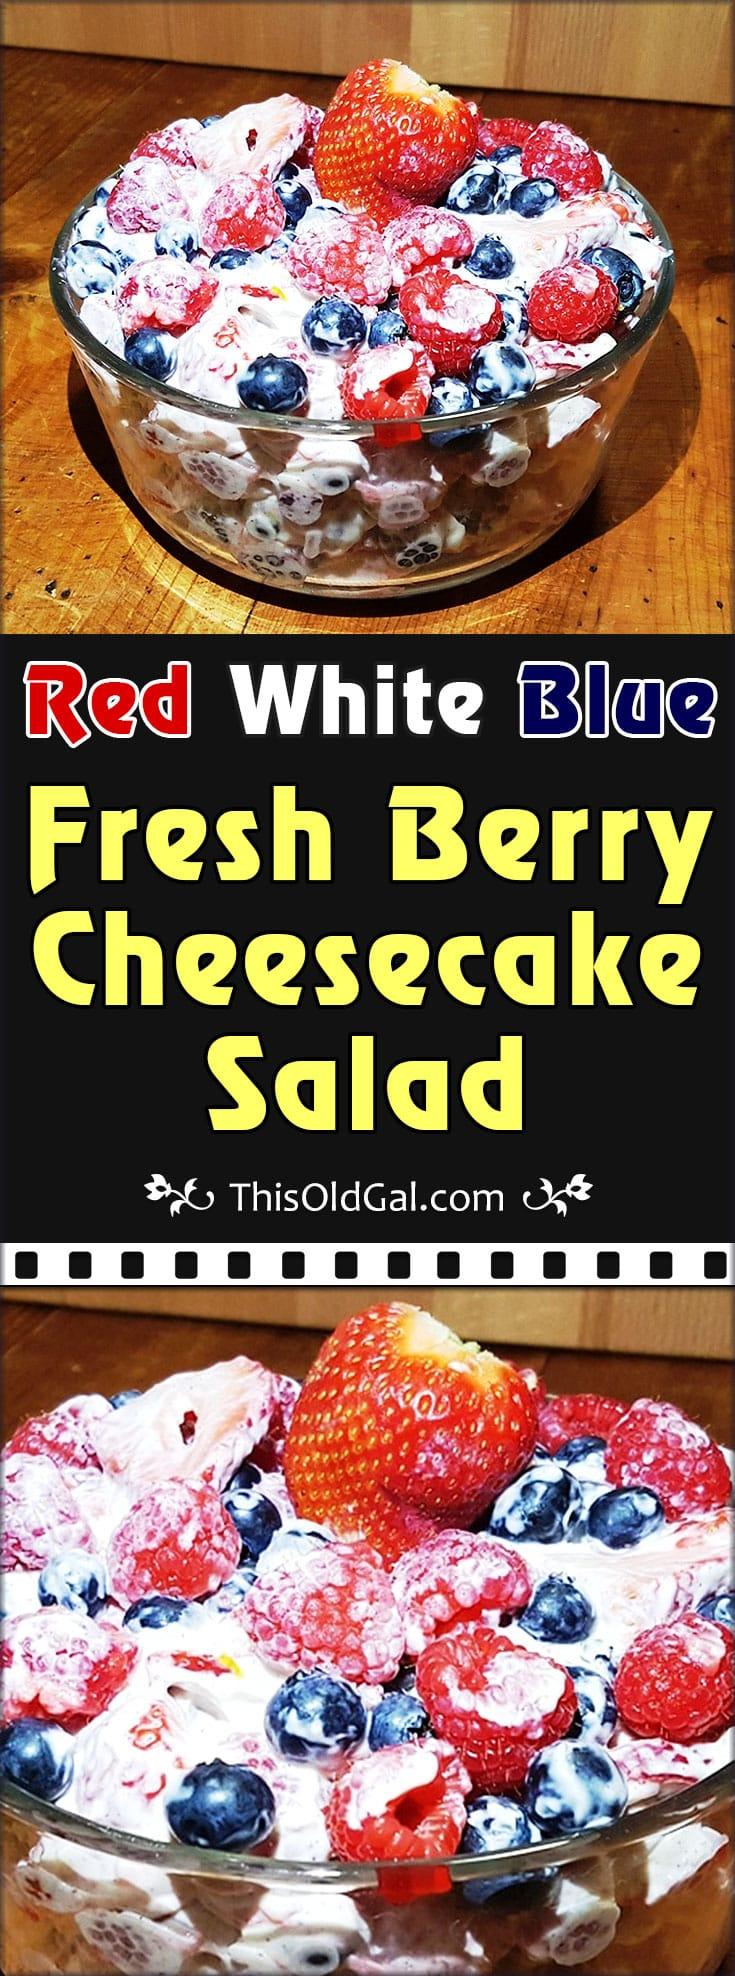 Red White Blue Fresh Berry Cheesecake Salad